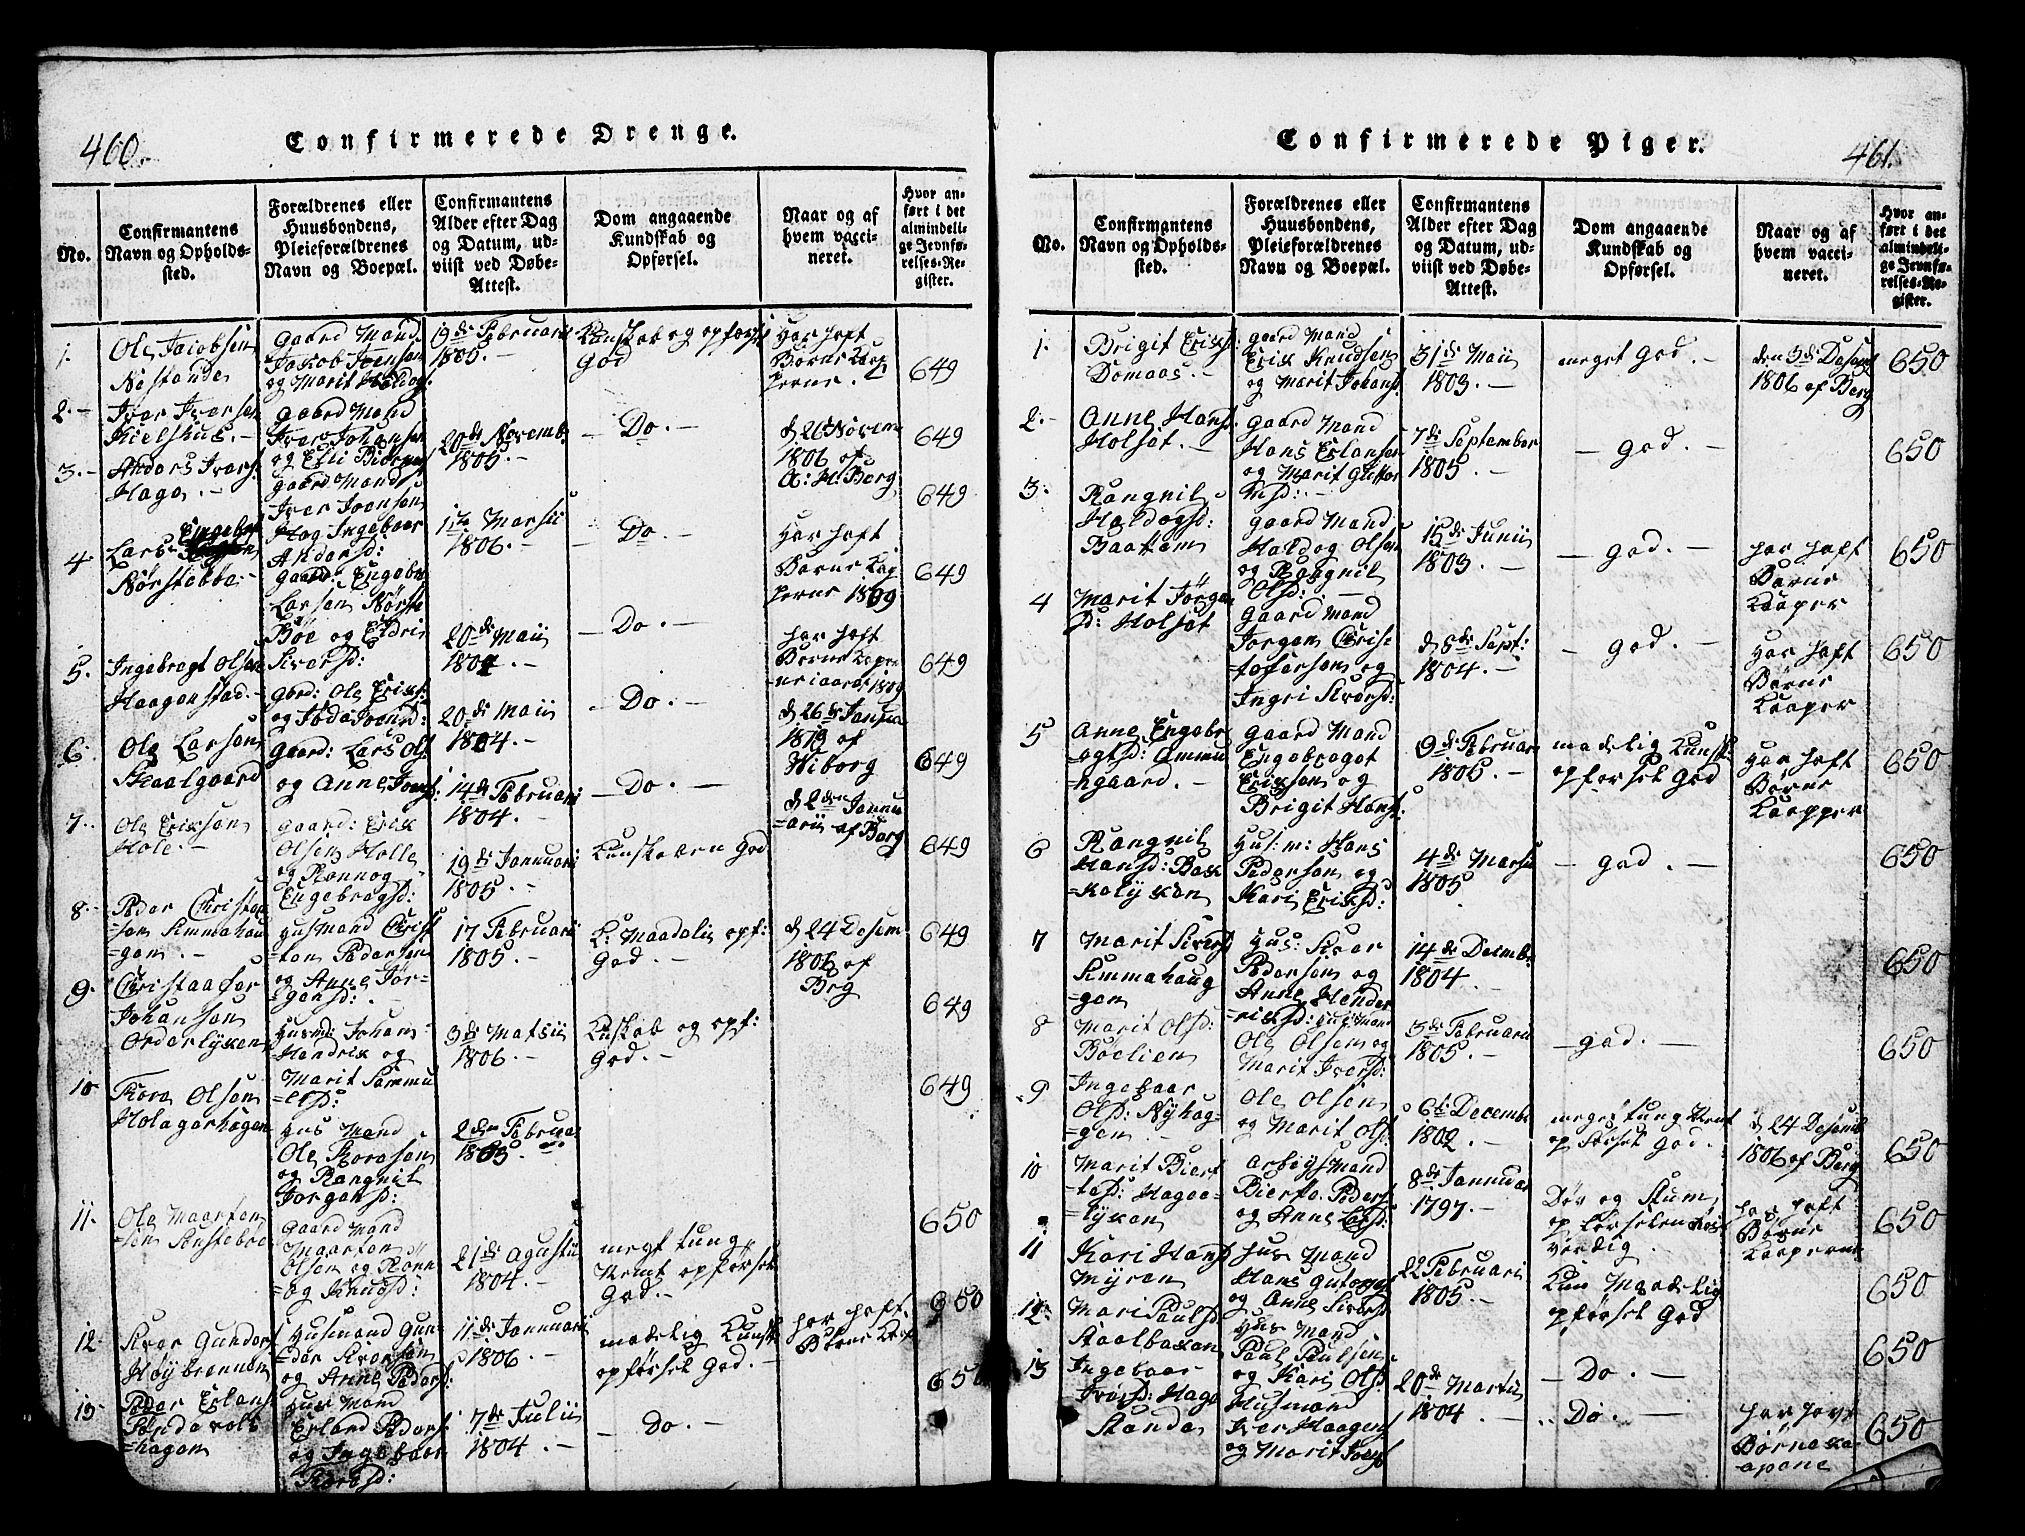 SAH, Lesja prestekontor, Klokkerbok nr. 1, 1820-1831, s. 460-461